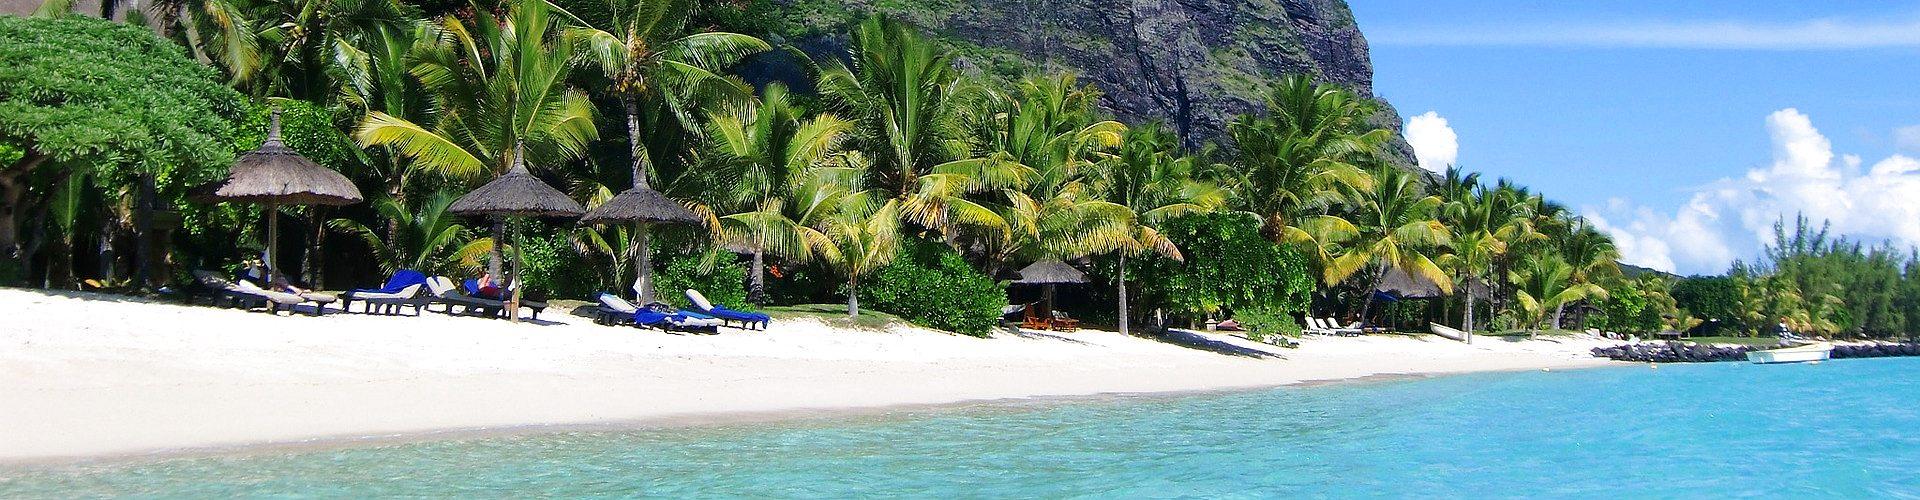 Reisetipps zum Thema: Strandurlaub